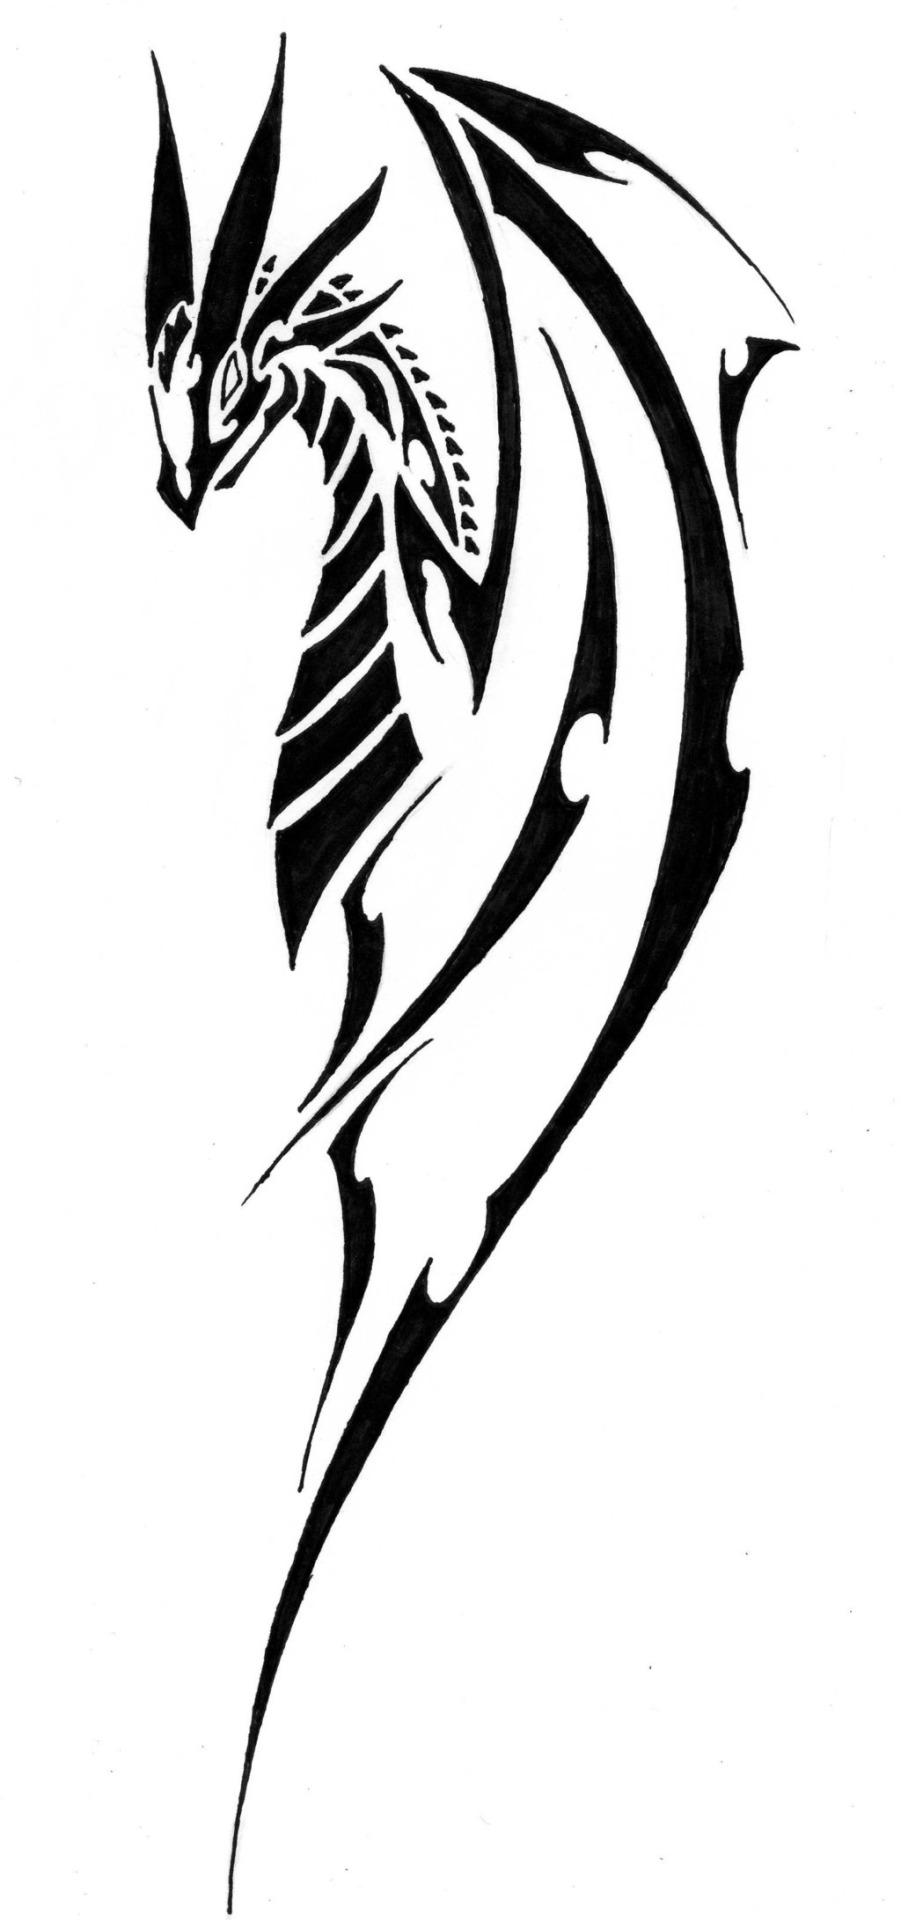 901x1920 Simple Tribal Dragon Tattoos